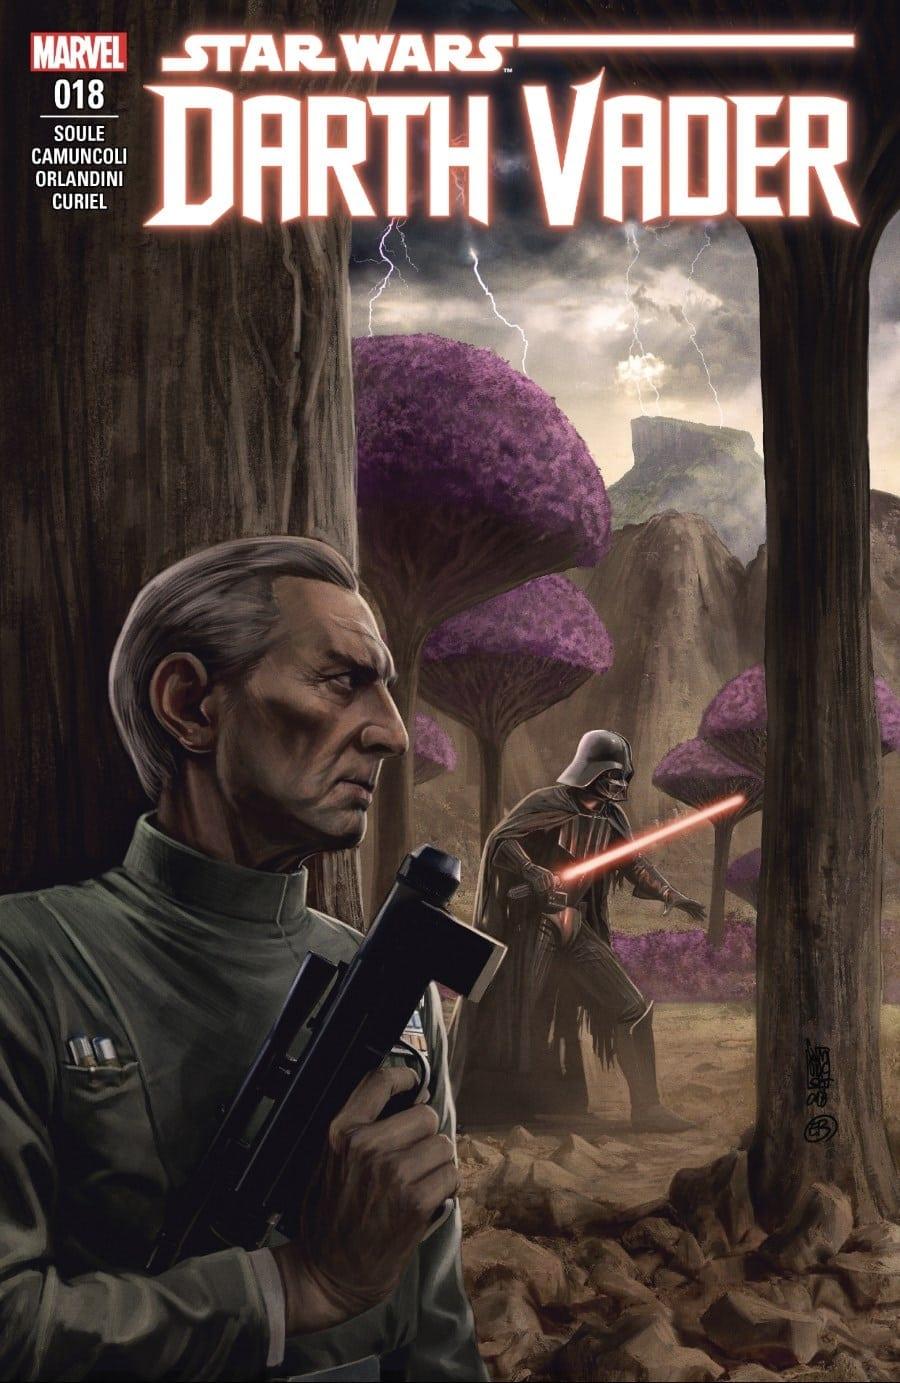 Darth Vader #18 Bad Ground Cover